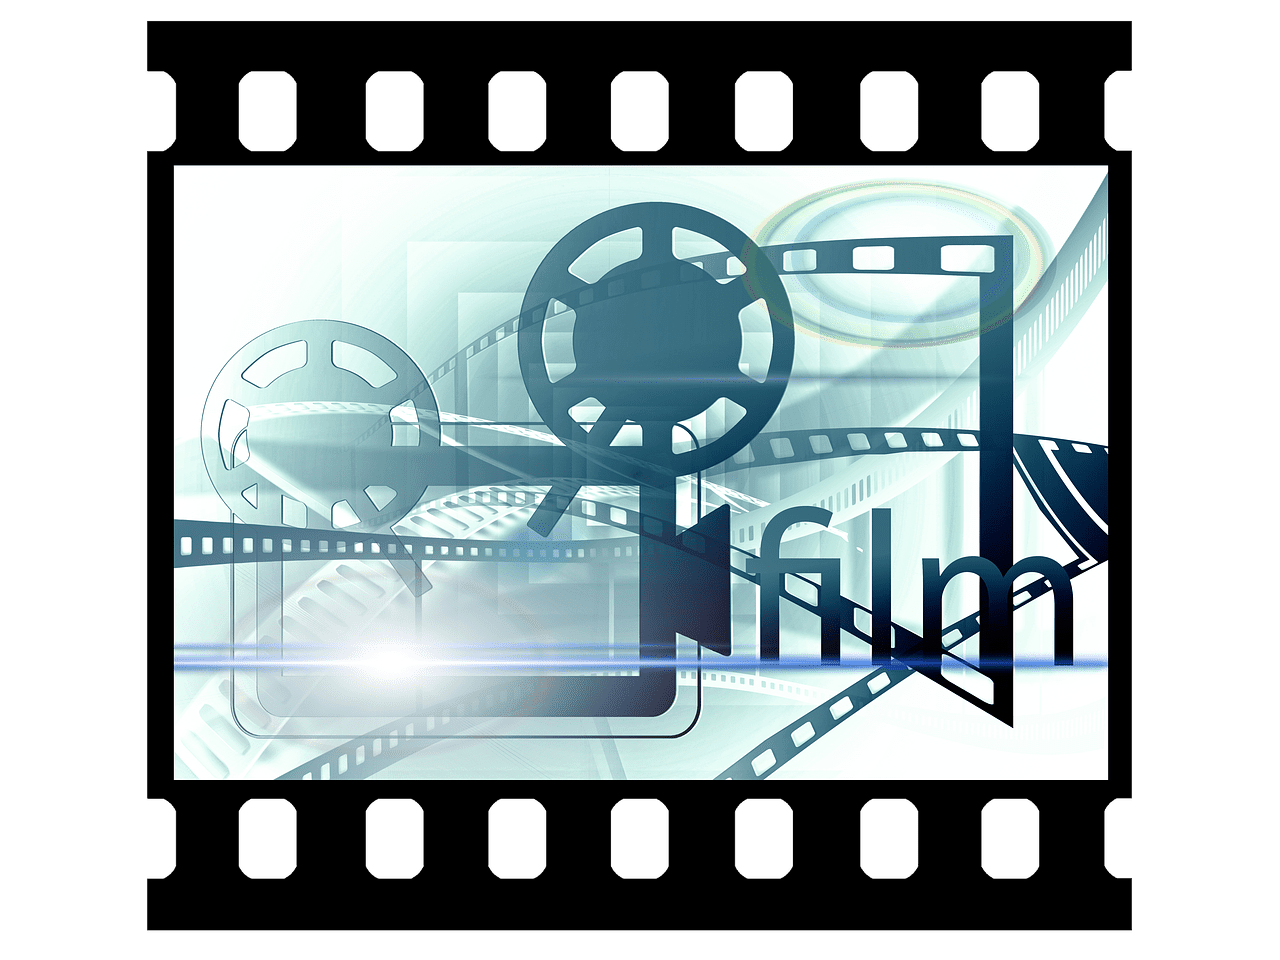 Best movie downloader app for windows phone 8.1